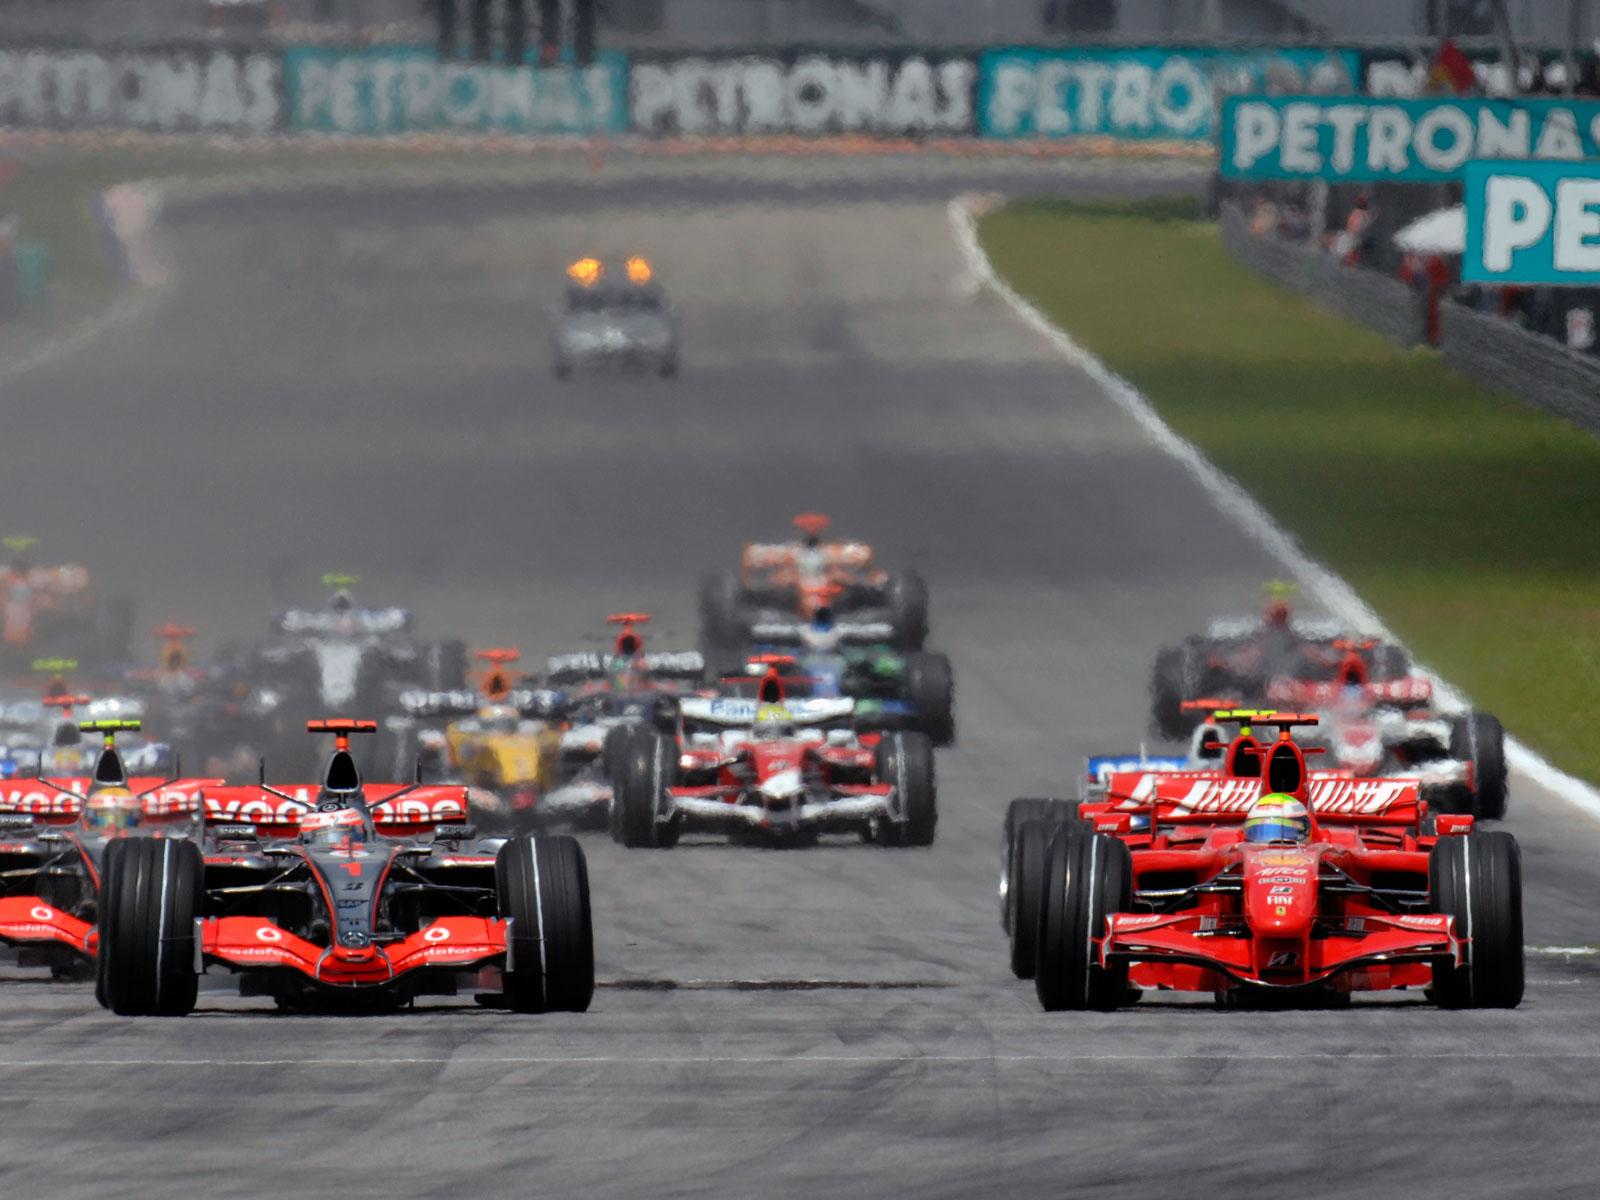 HD Wallpapers 2007 Formula 1 Grand Prix of Malaysia | F1-Fansite.com Red Bull Wallpaper